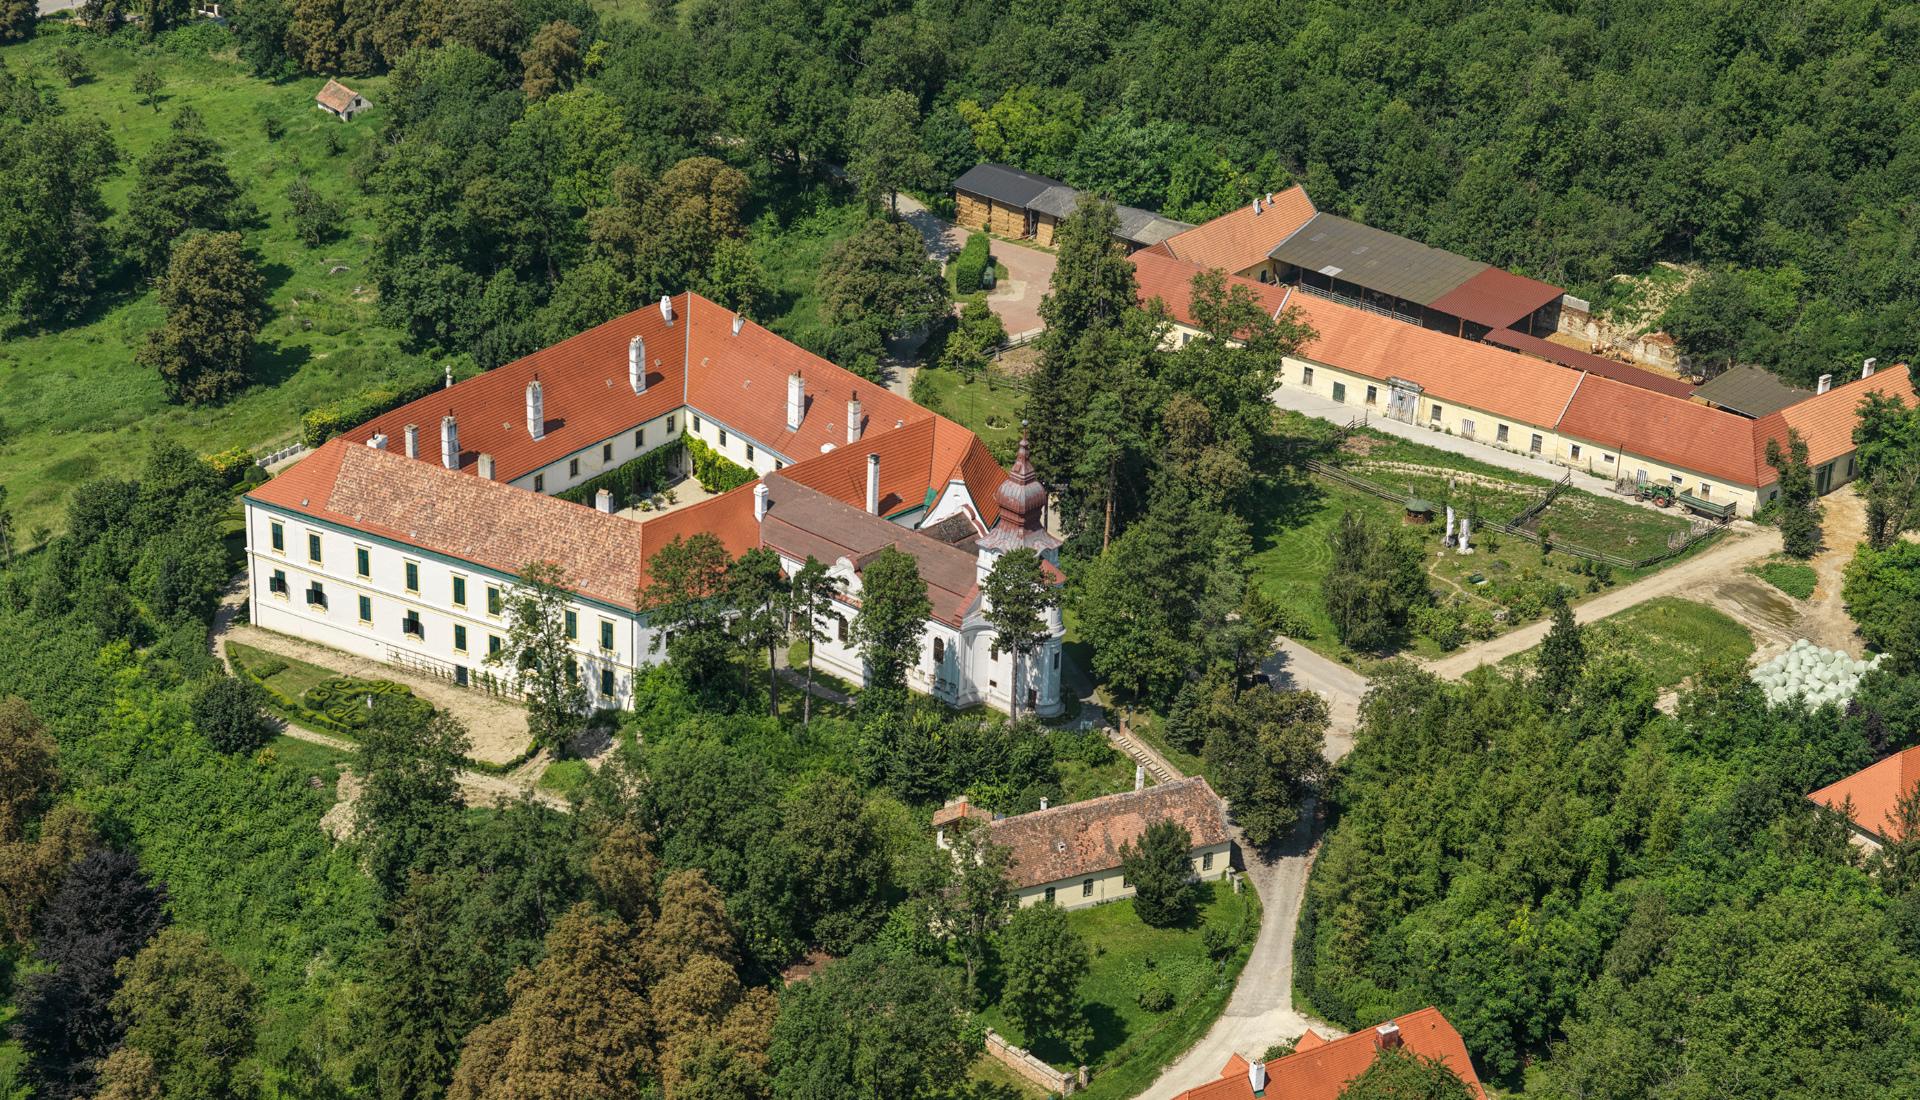 Zámek Loosdorf-Rakousko - Letova fotografie - Miroslav Kamrla - 2- 1920x1110_5